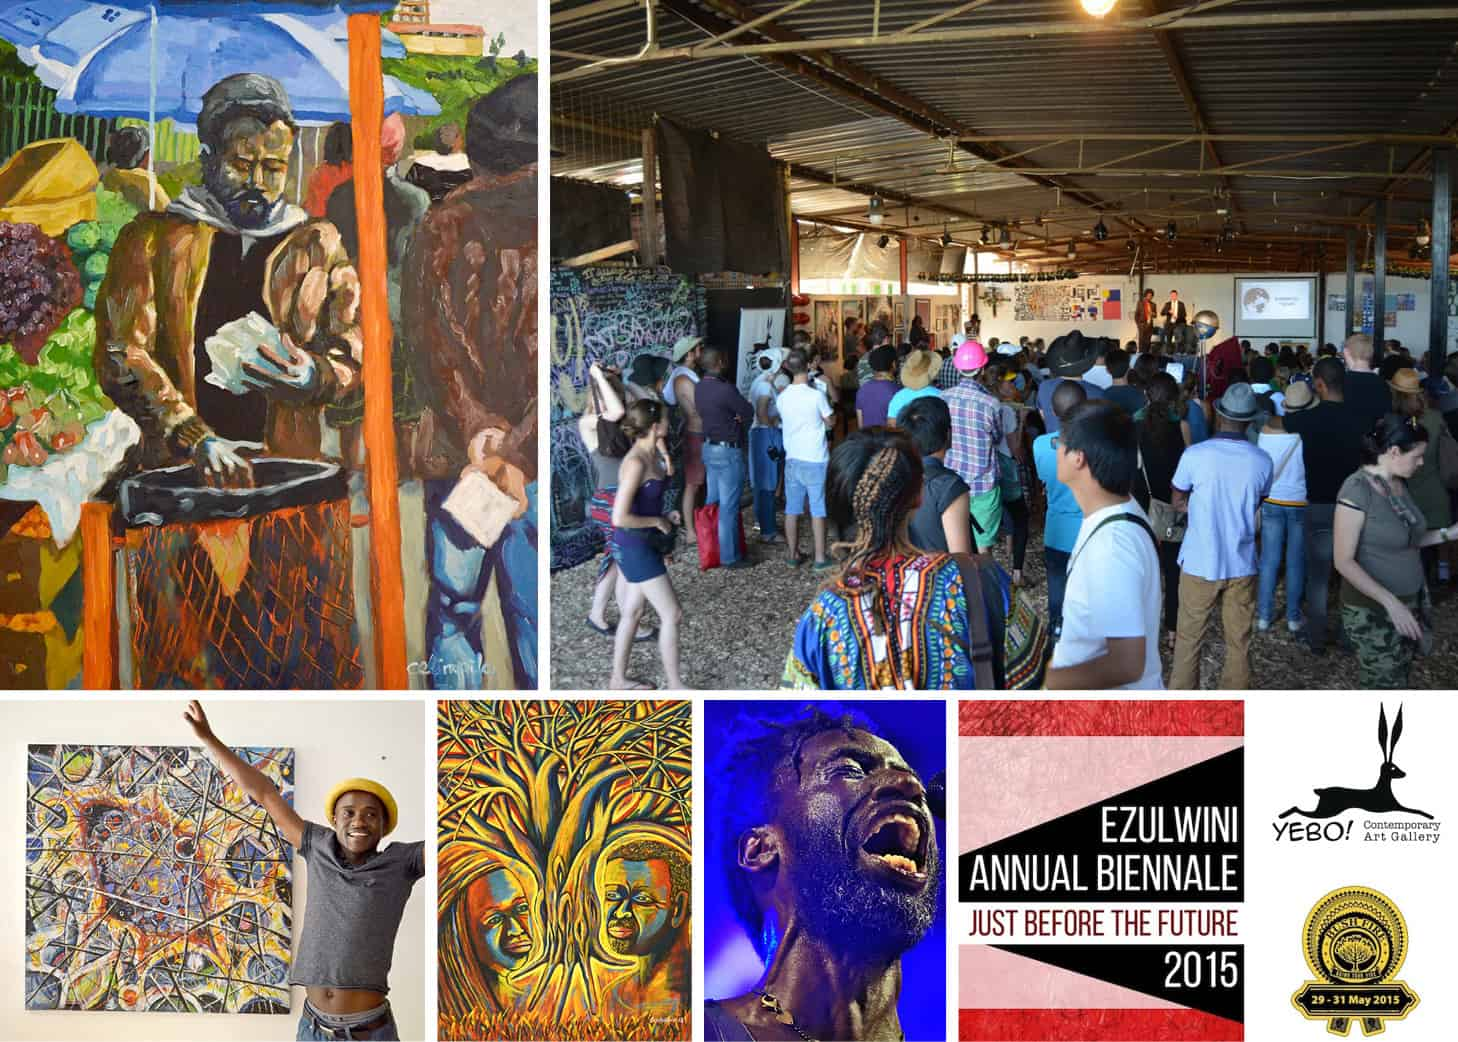 STORIA Ezulwini Swaziland 1